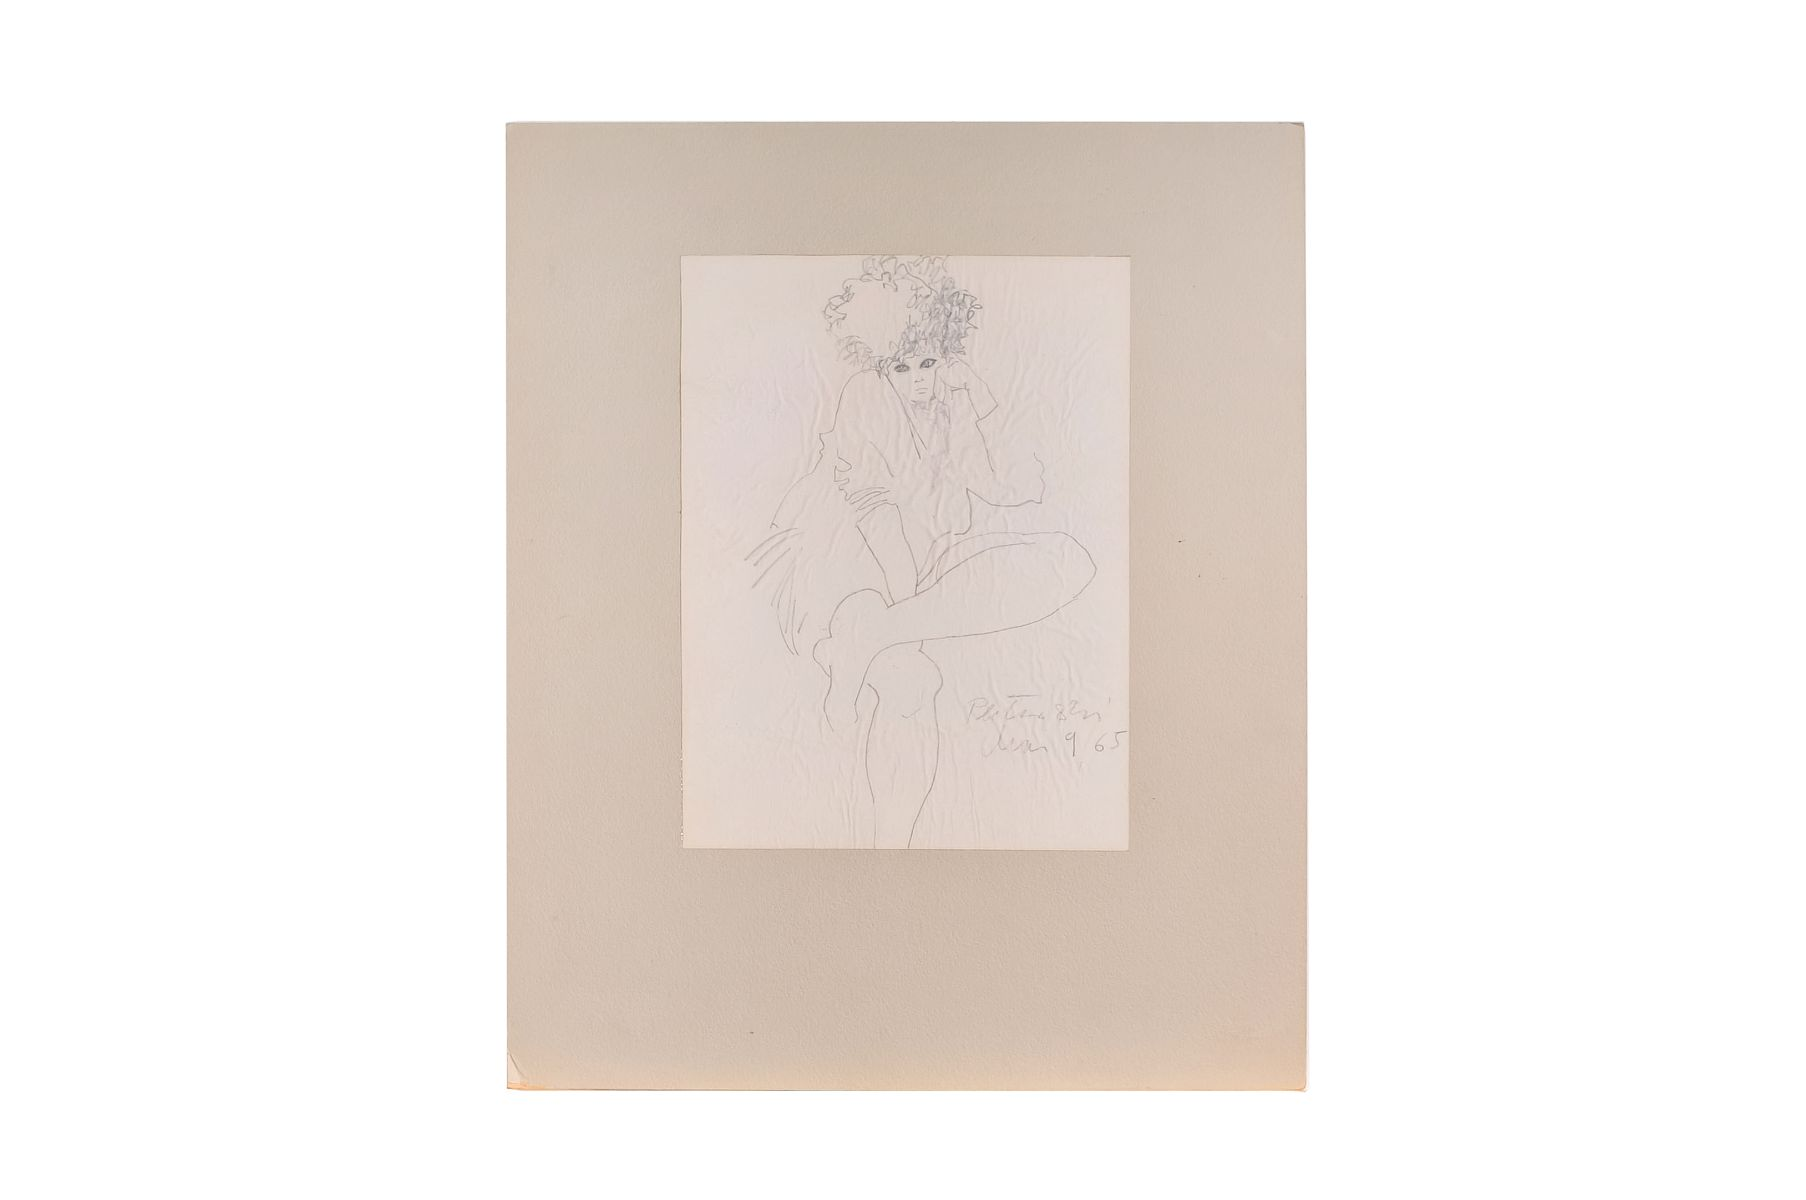 "#106 Roland Pleterski ""Untitled"" | Roland Pleterski (1920 – 2000) ""Ohne Titel"" Image"